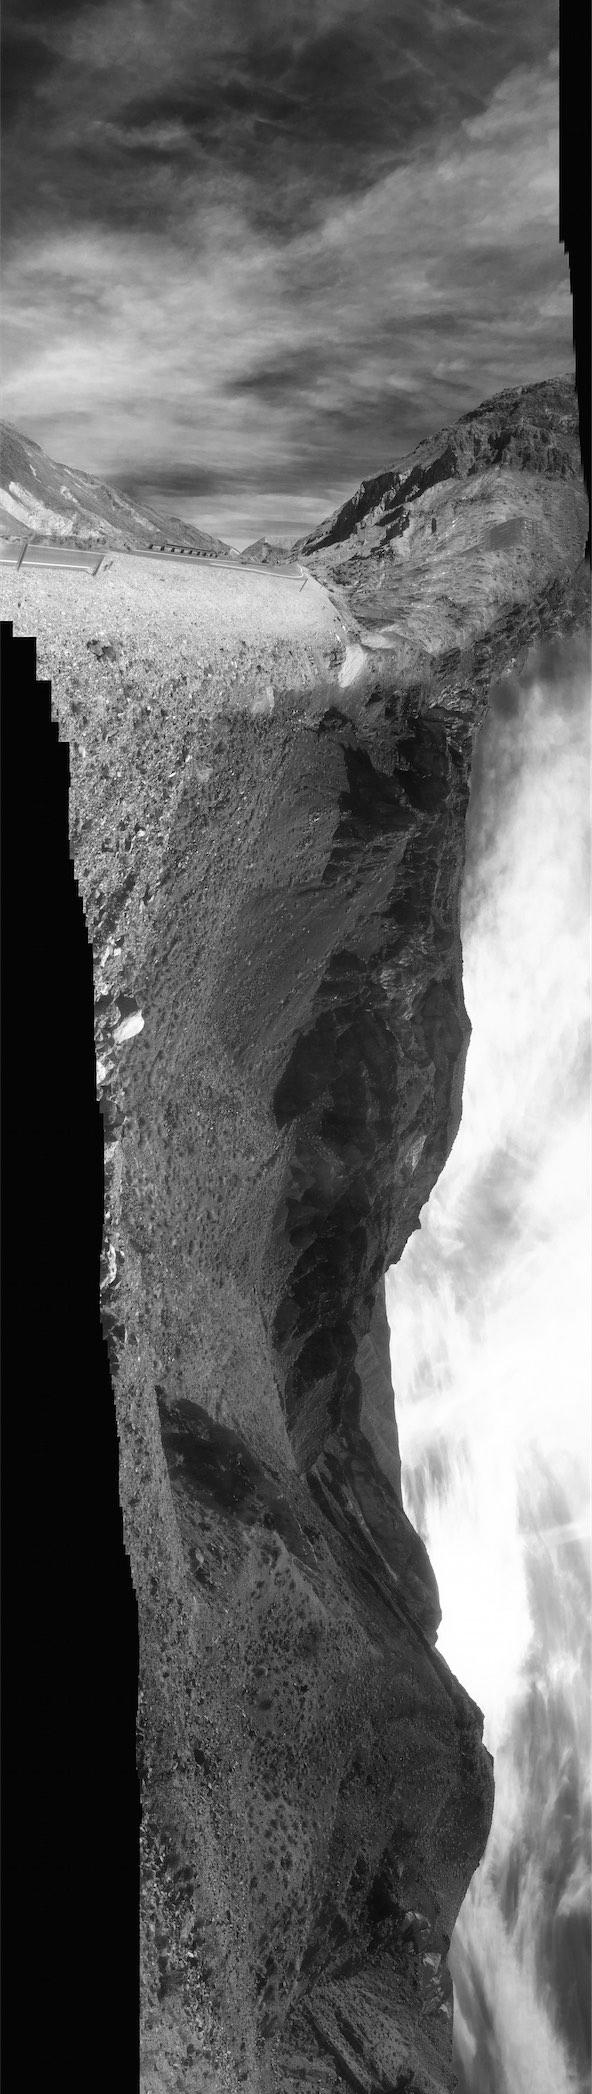 DV-Inbound_9Mar2016_7 Photograph, 2016  Copyright © Tennyson Woodbridge, 1963 to present